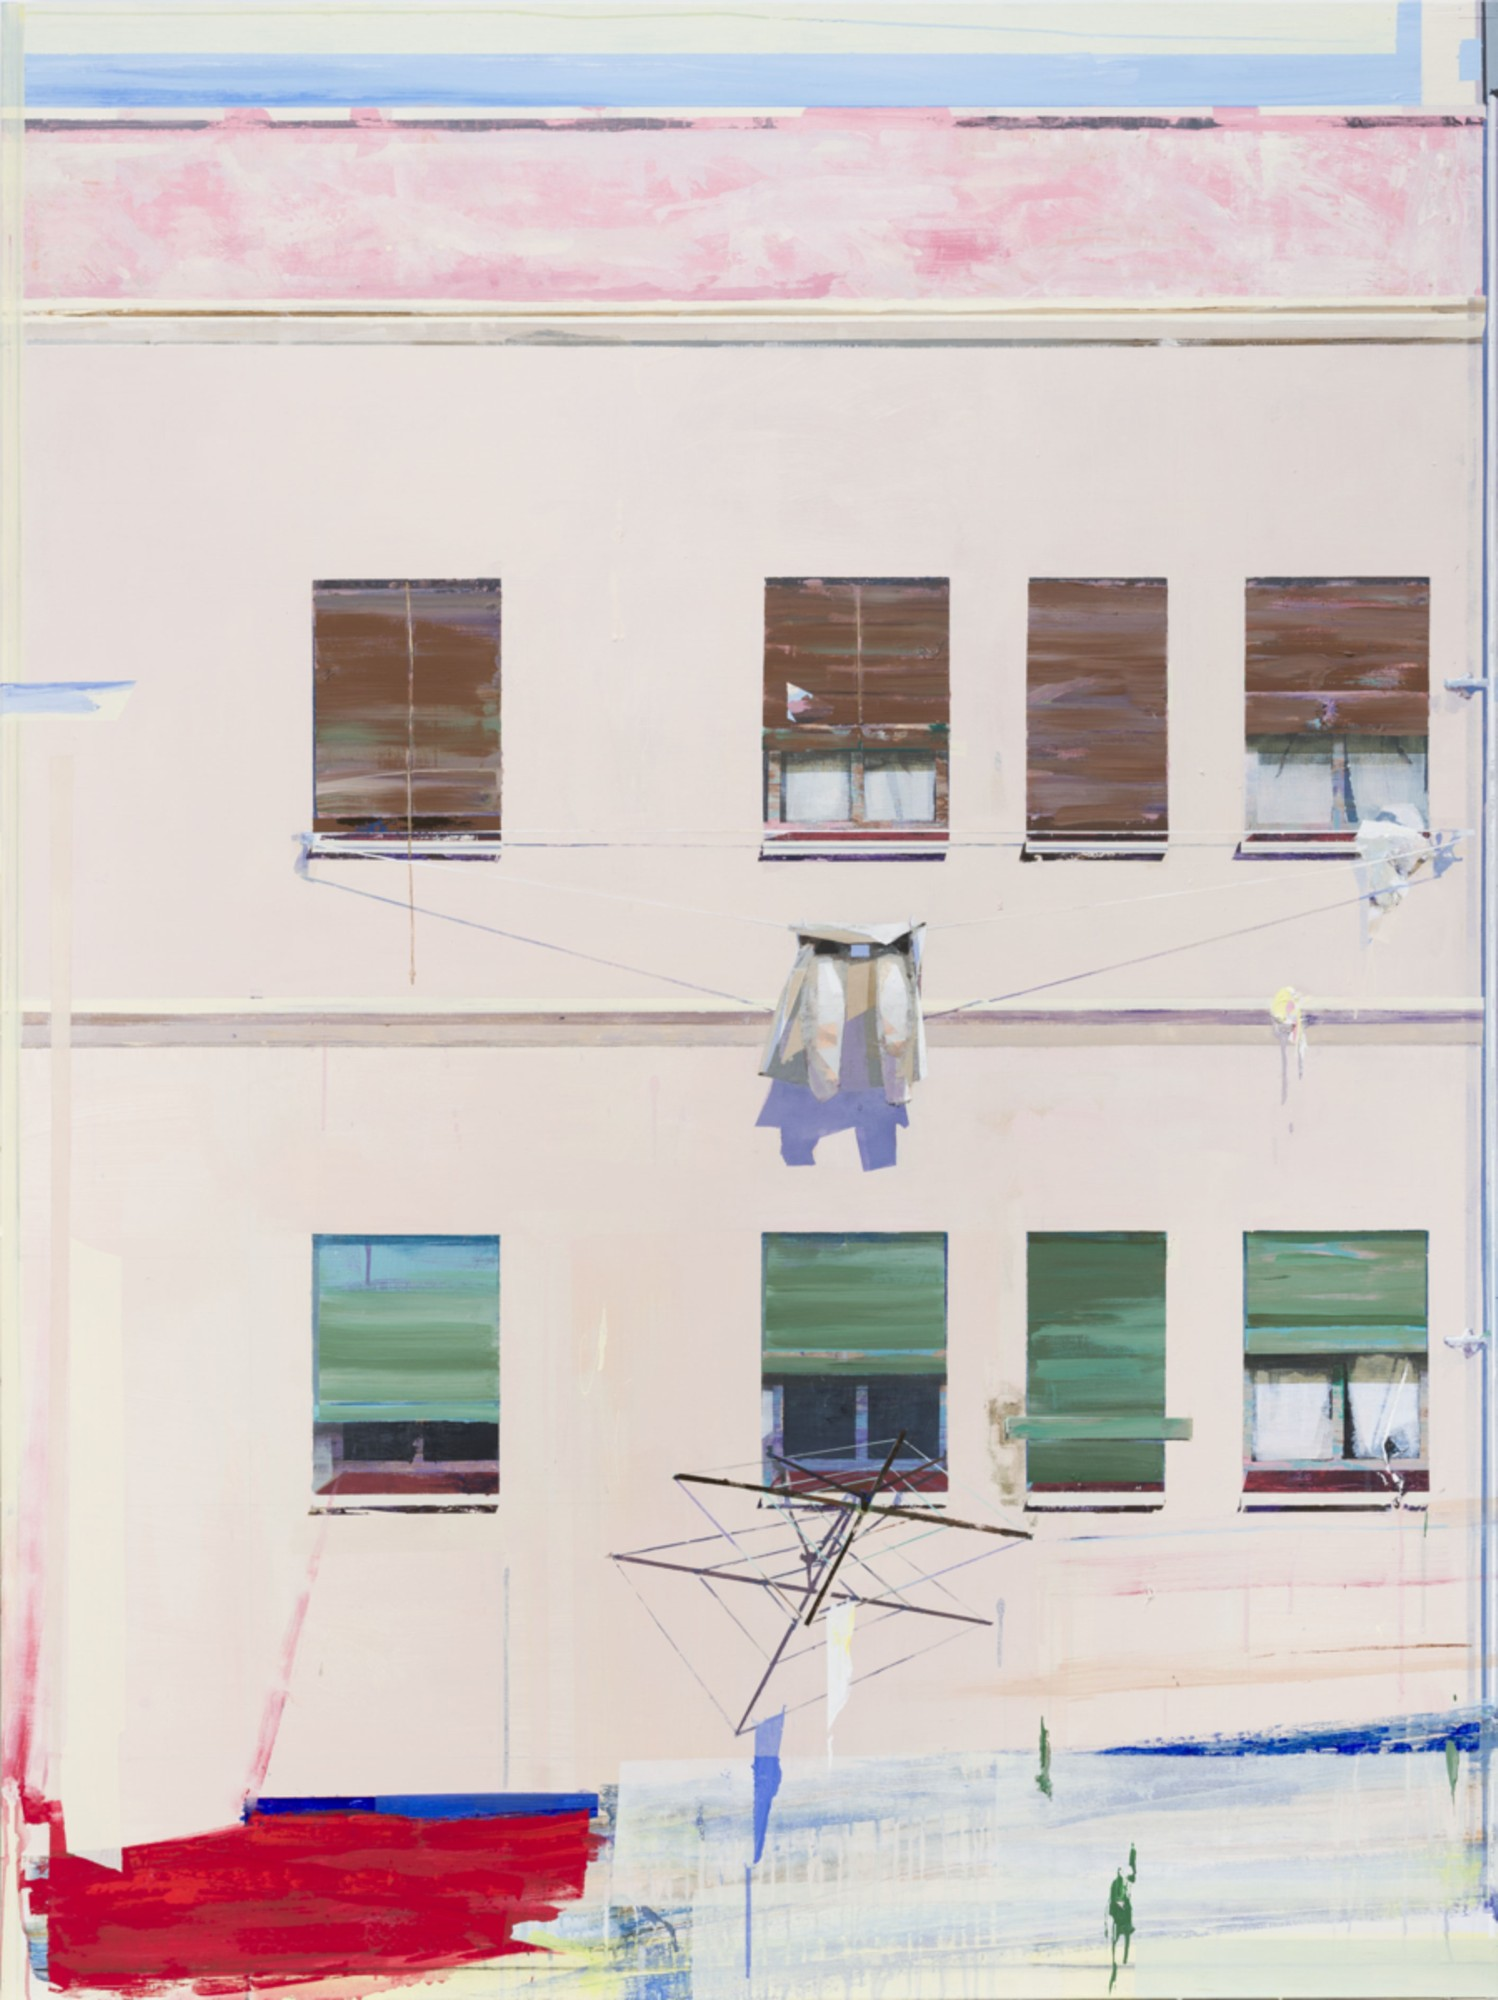 18.-albacete.-patio-interior-diptico1